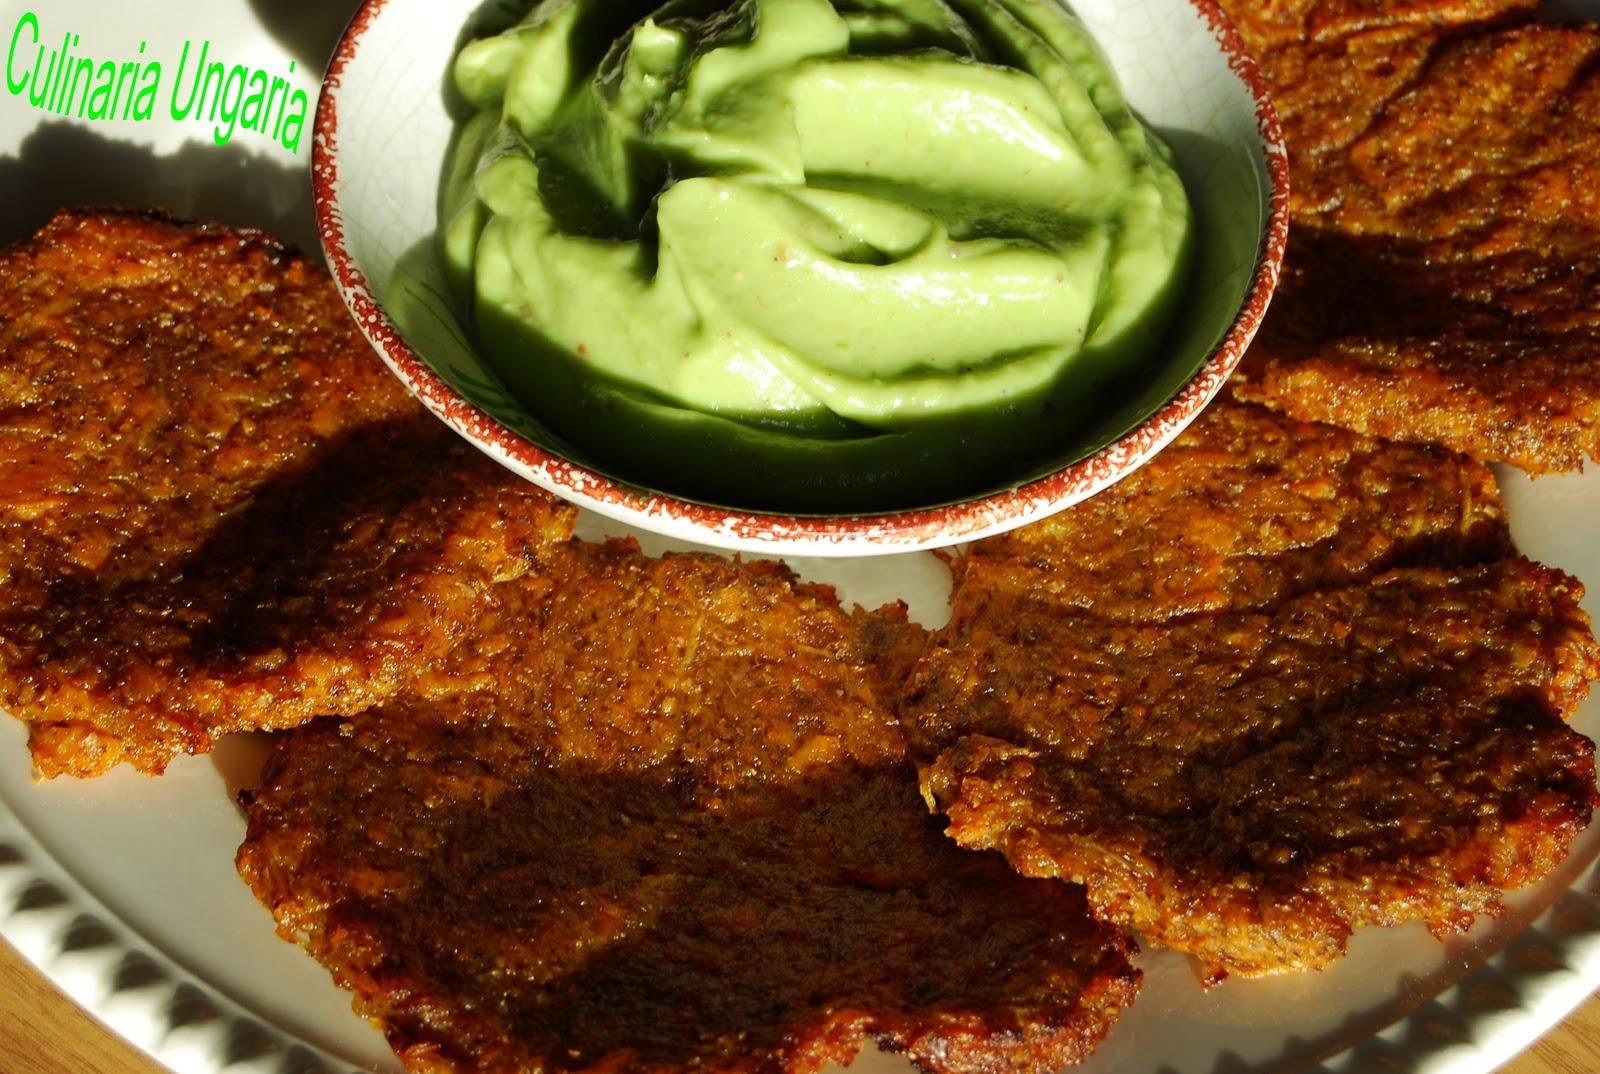 culinaria ungaria s kartoffel reibekuchen mit avocado dip. Black Bedroom Furniture Sets. Home Design Ideas